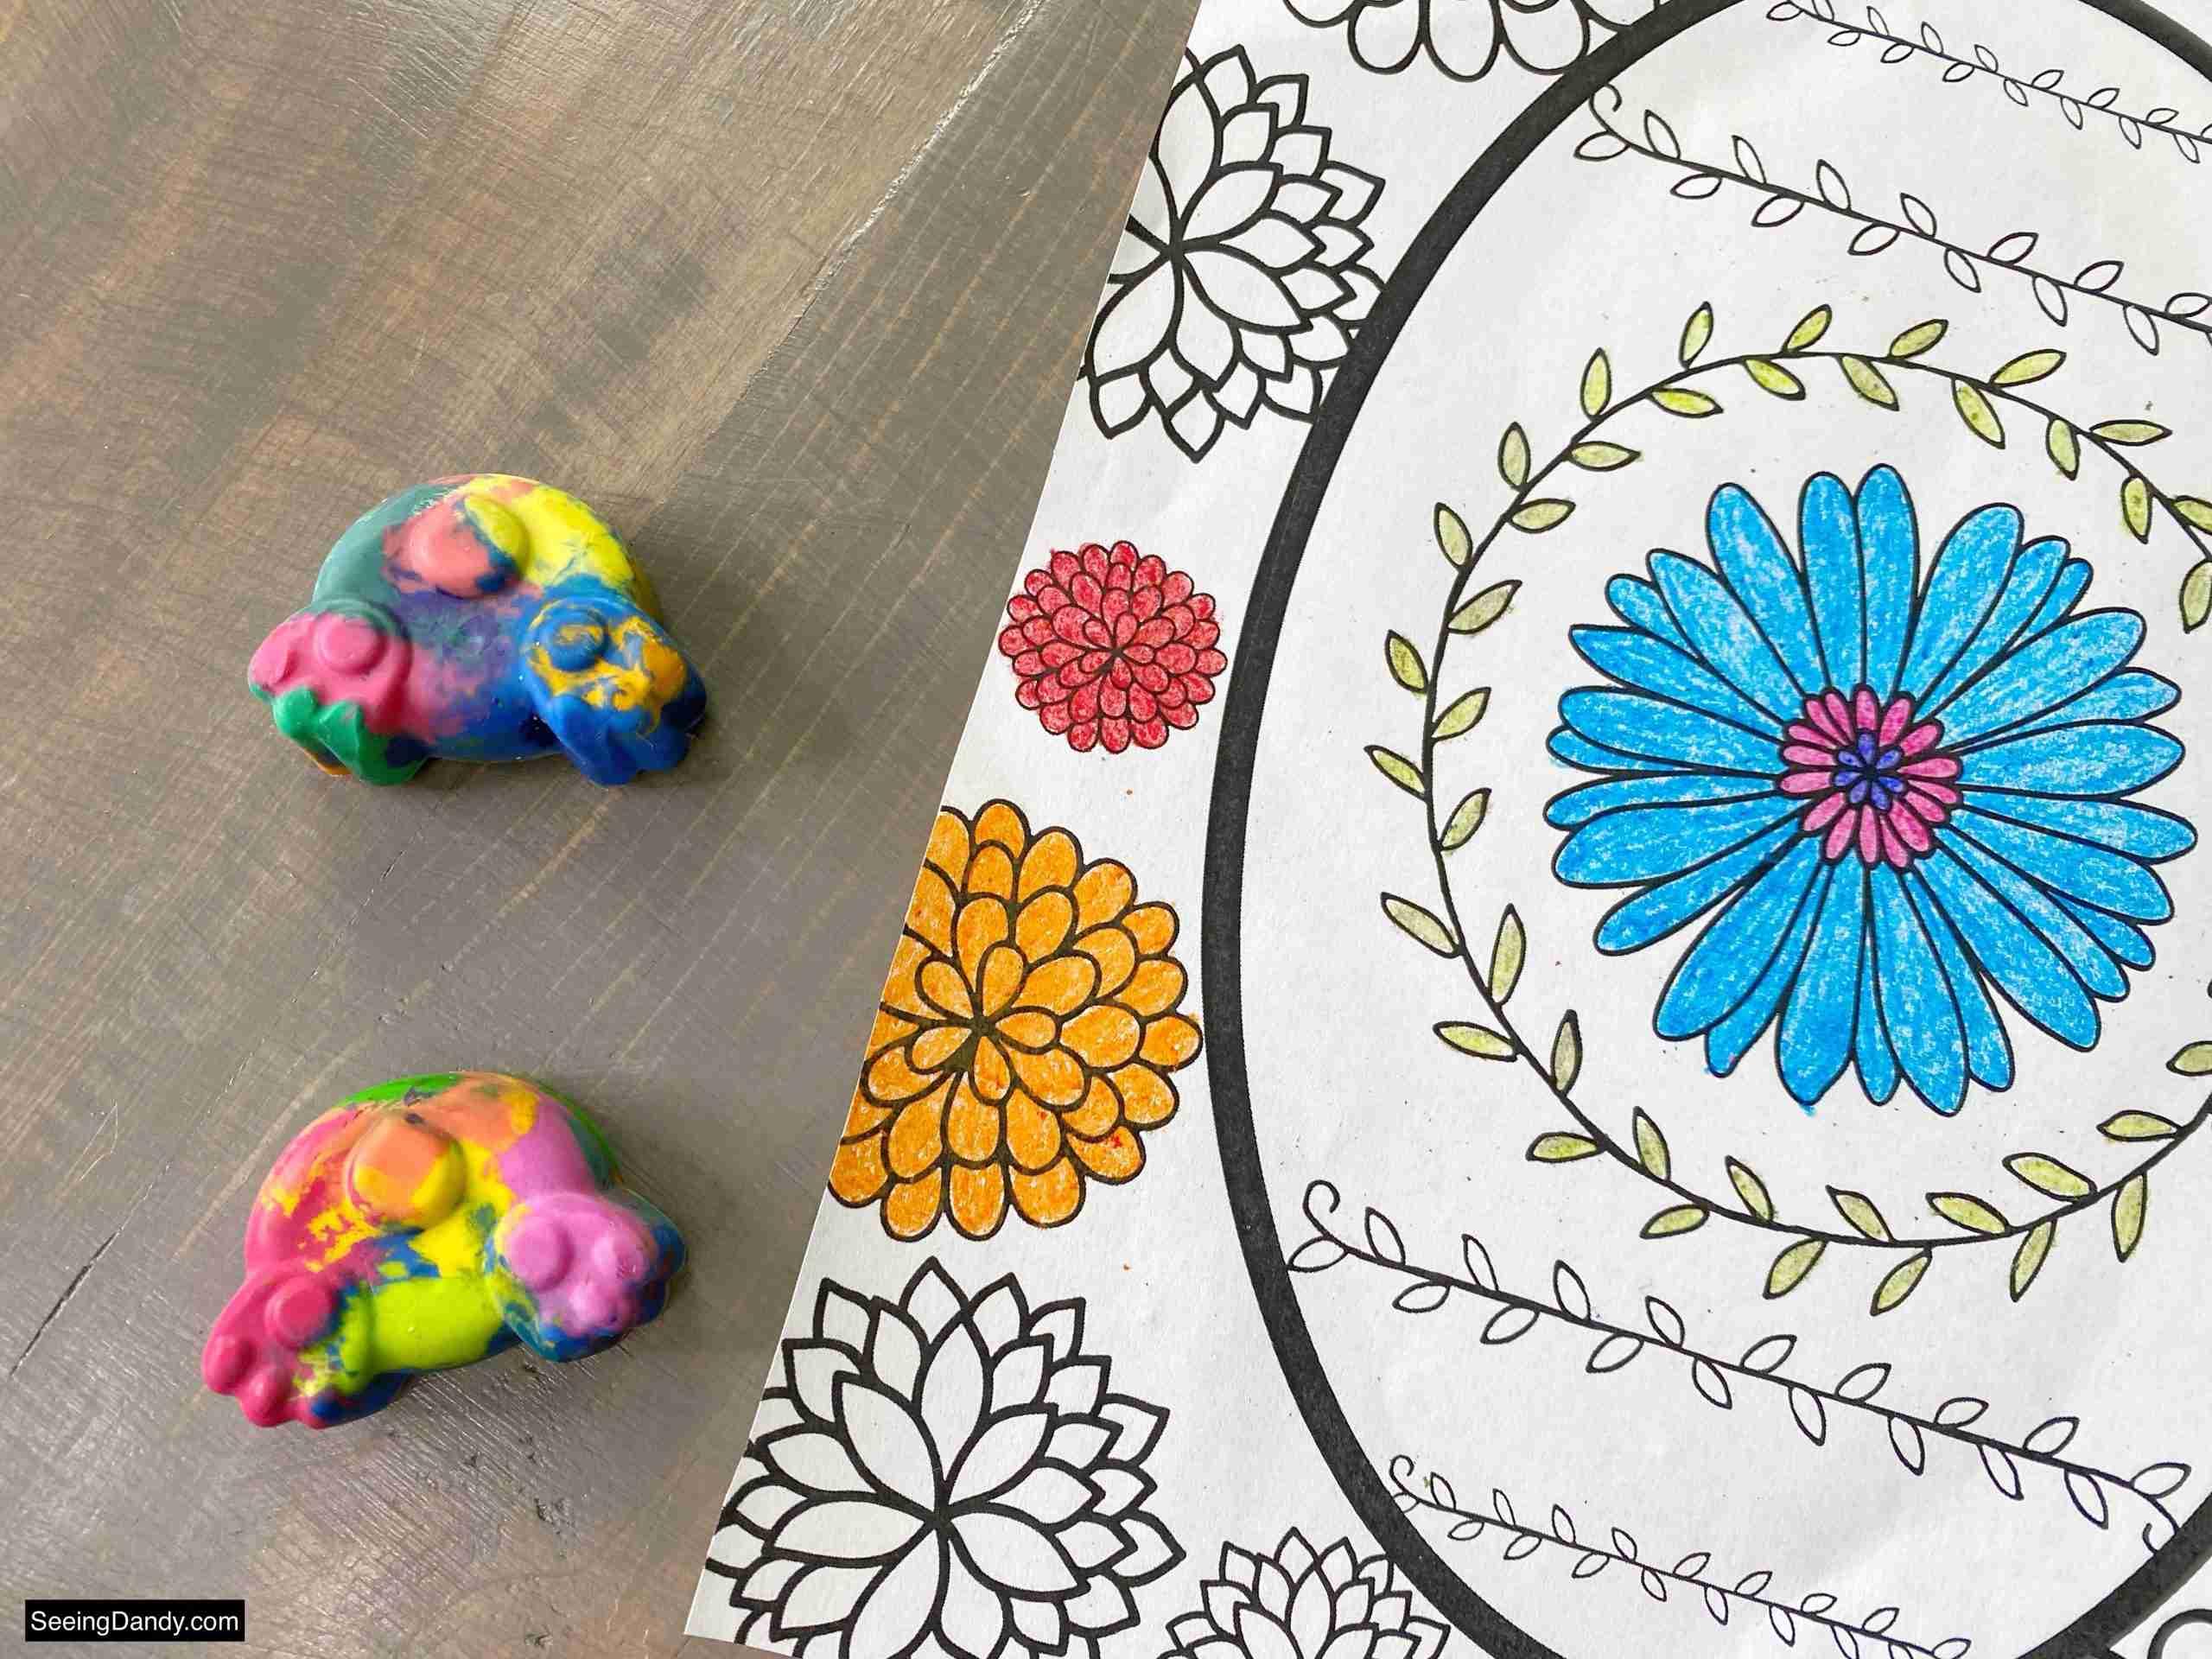 diy easter bunny crayons, easter crafts, melting crayons, faberge egg coloring page, free printable coloring sheet, easter coloring page, spring crafts, kids crafts, easter basket